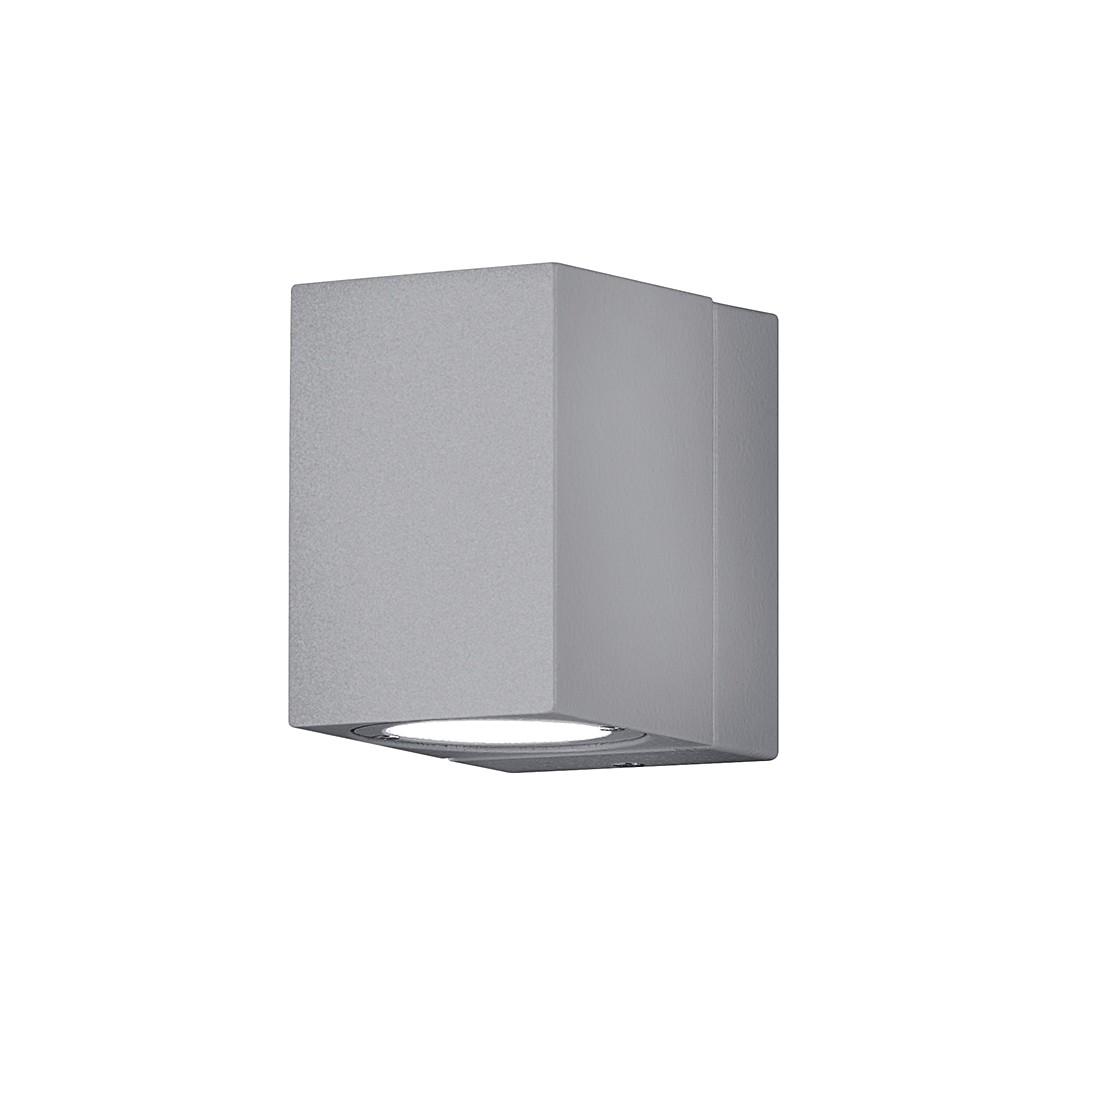 EEK A+, LED-Außenleuchte Tiber 1-flammig - Aluminium Kunststoff - Silber, Trio